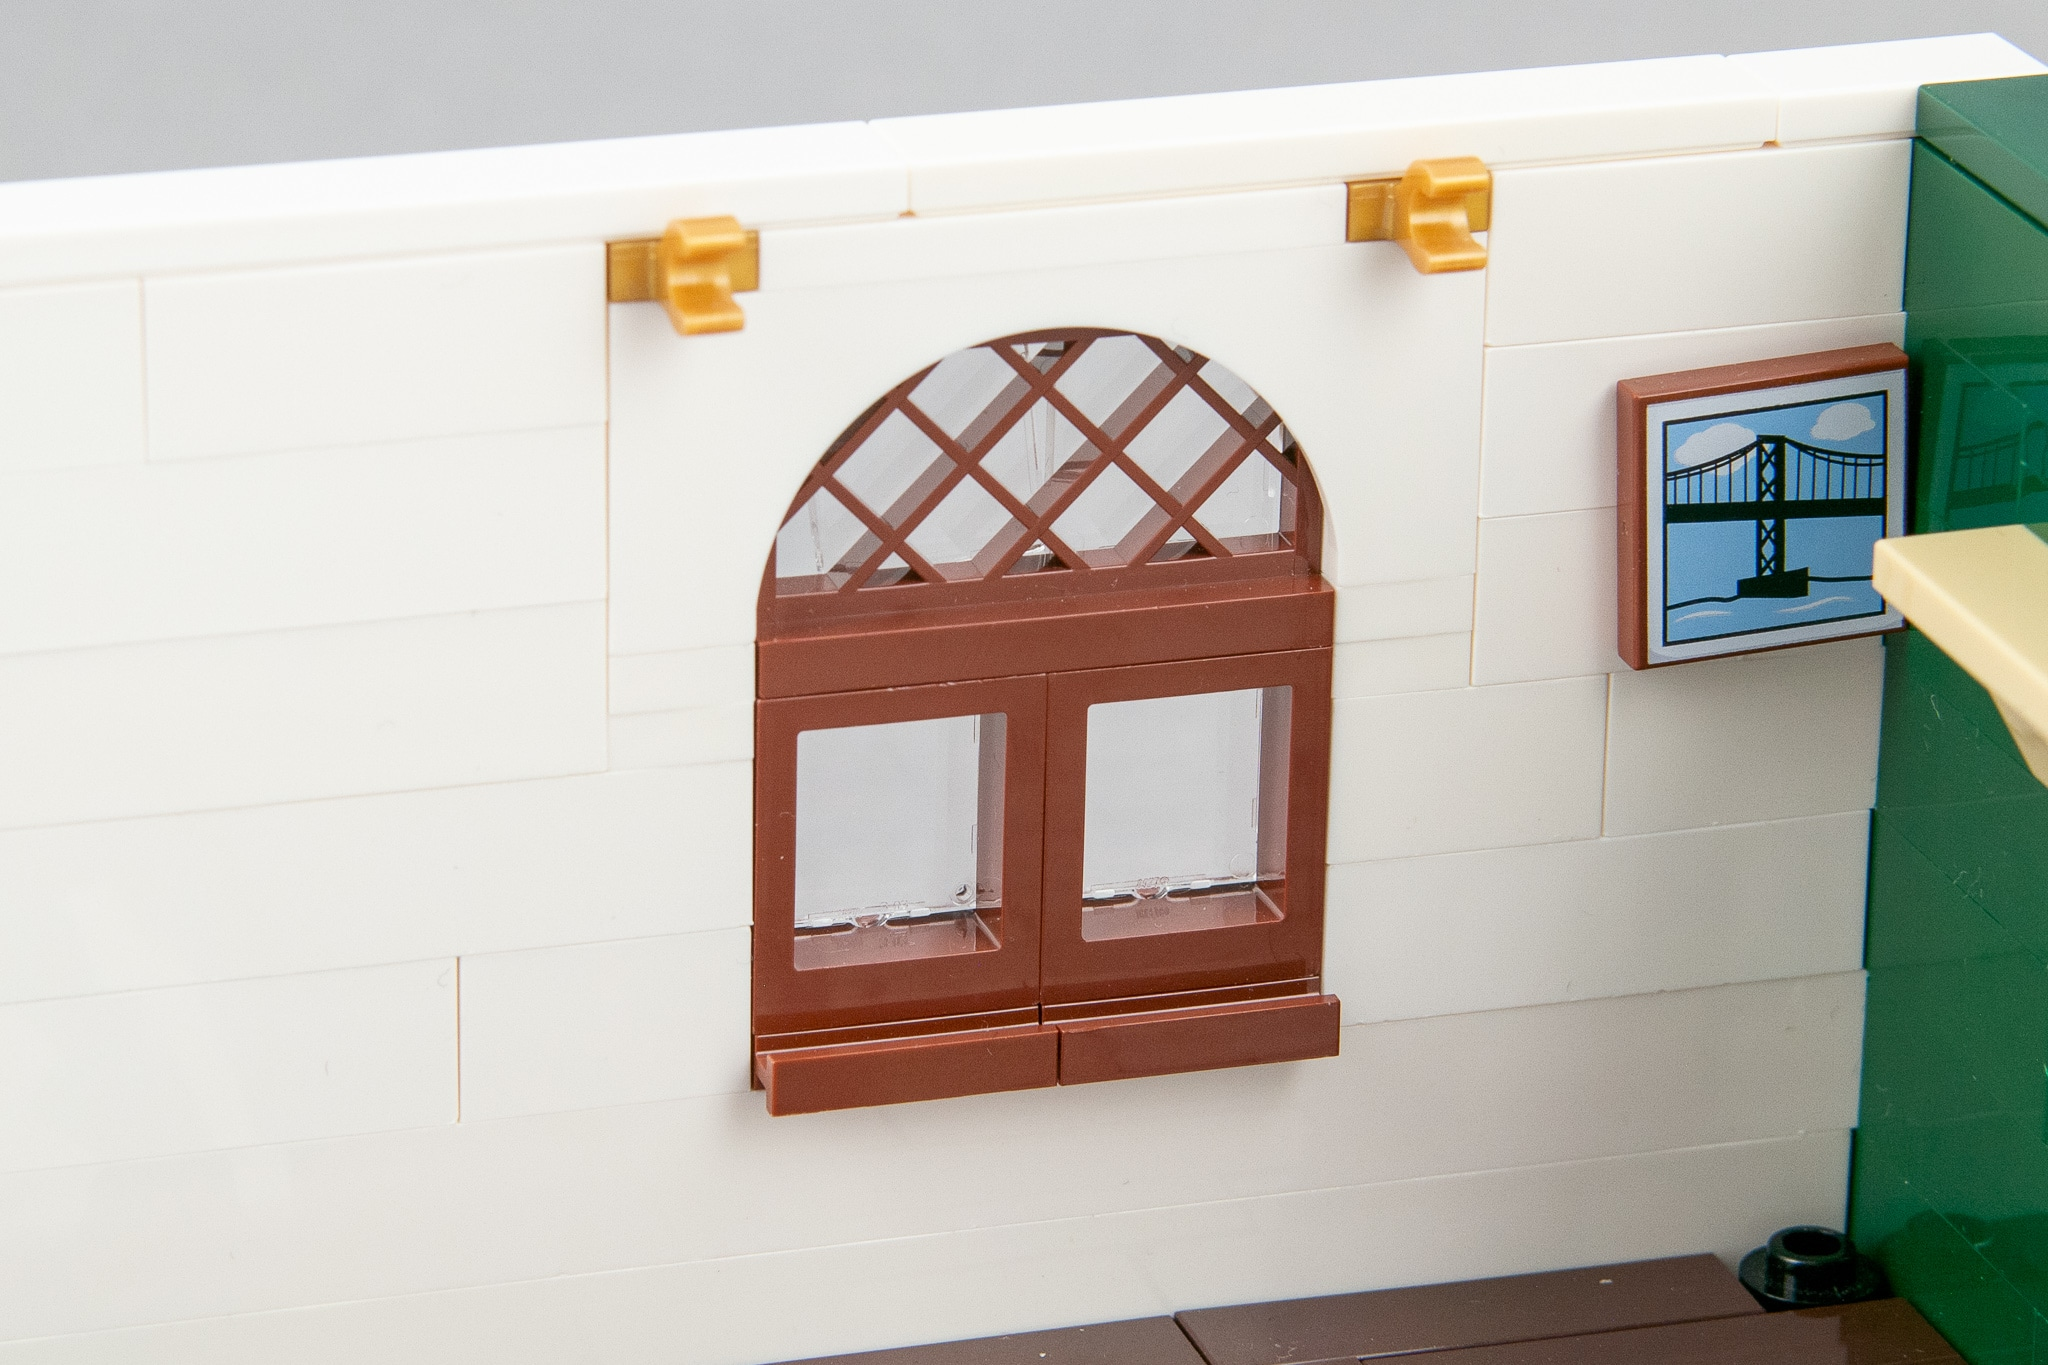 LEGO Schlafzimmer Moc (17)